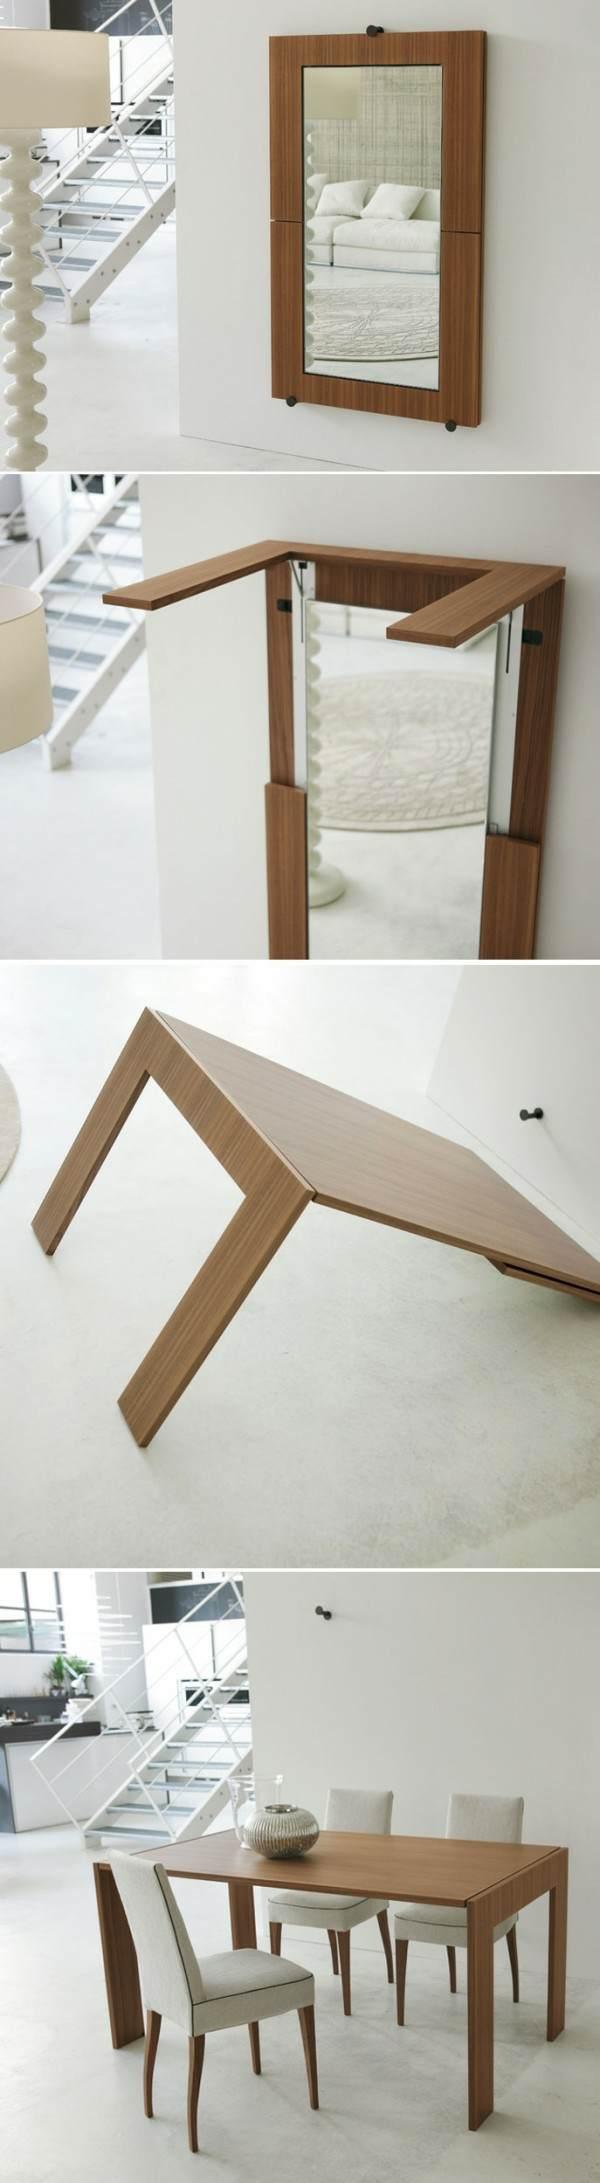 table manger deco miroir design